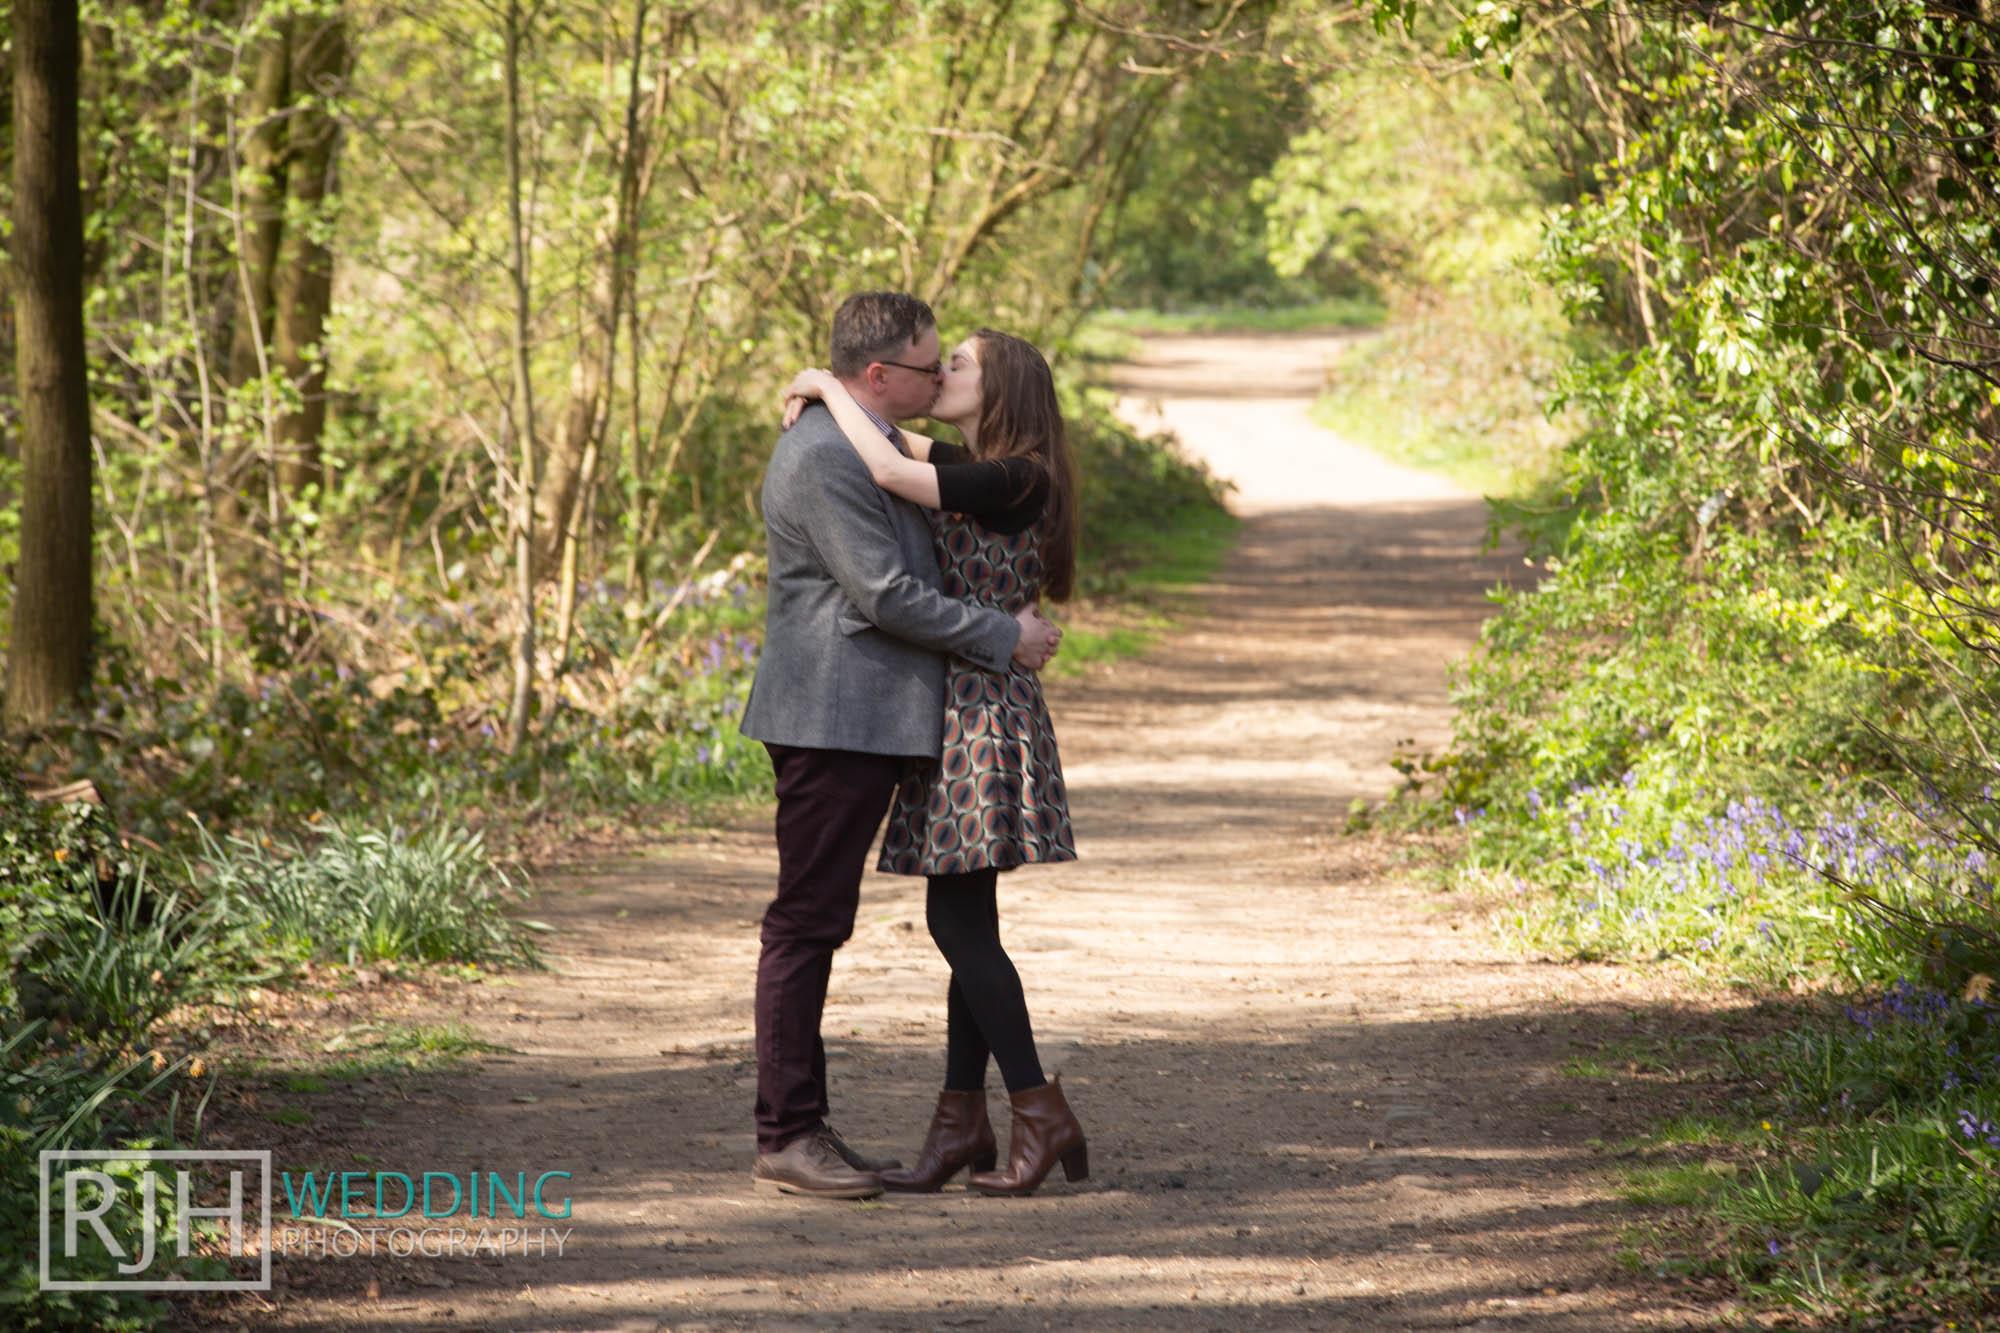 Pre-wedding photography - Richard & Rachel_023_3C2A8304.jpg